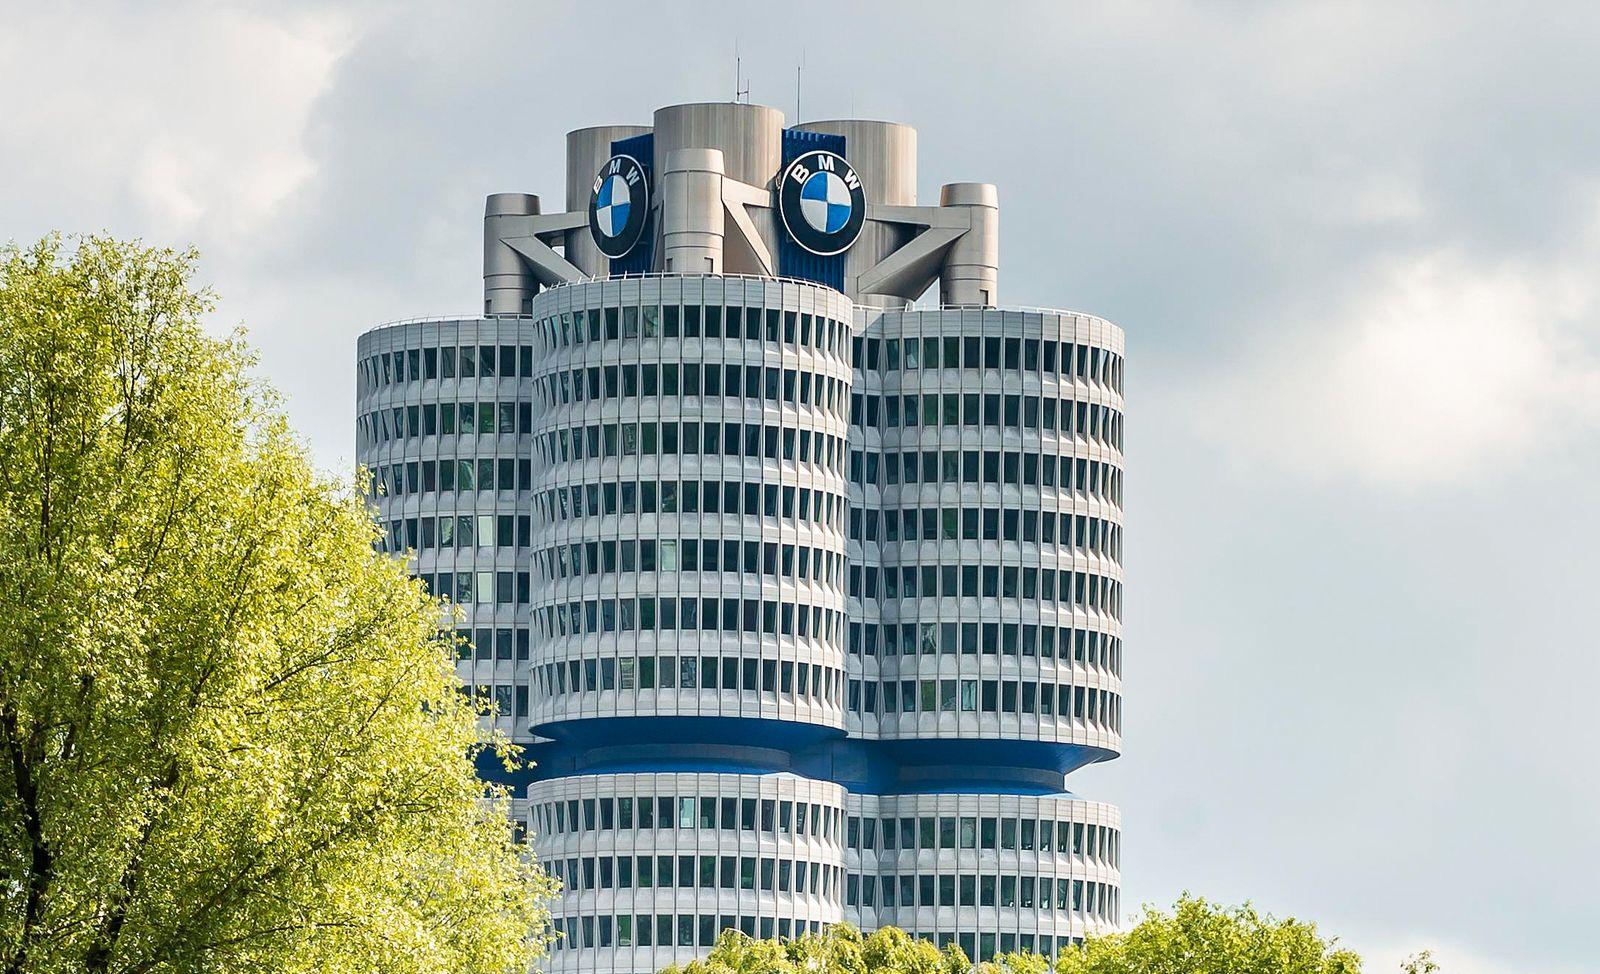 BMW-Vierzylinder, Olympiagel‰nde, M¸nchen, Oberbayern, Bayern, Deutschland, Europa *** BMW four-cylinder, Olympic site,